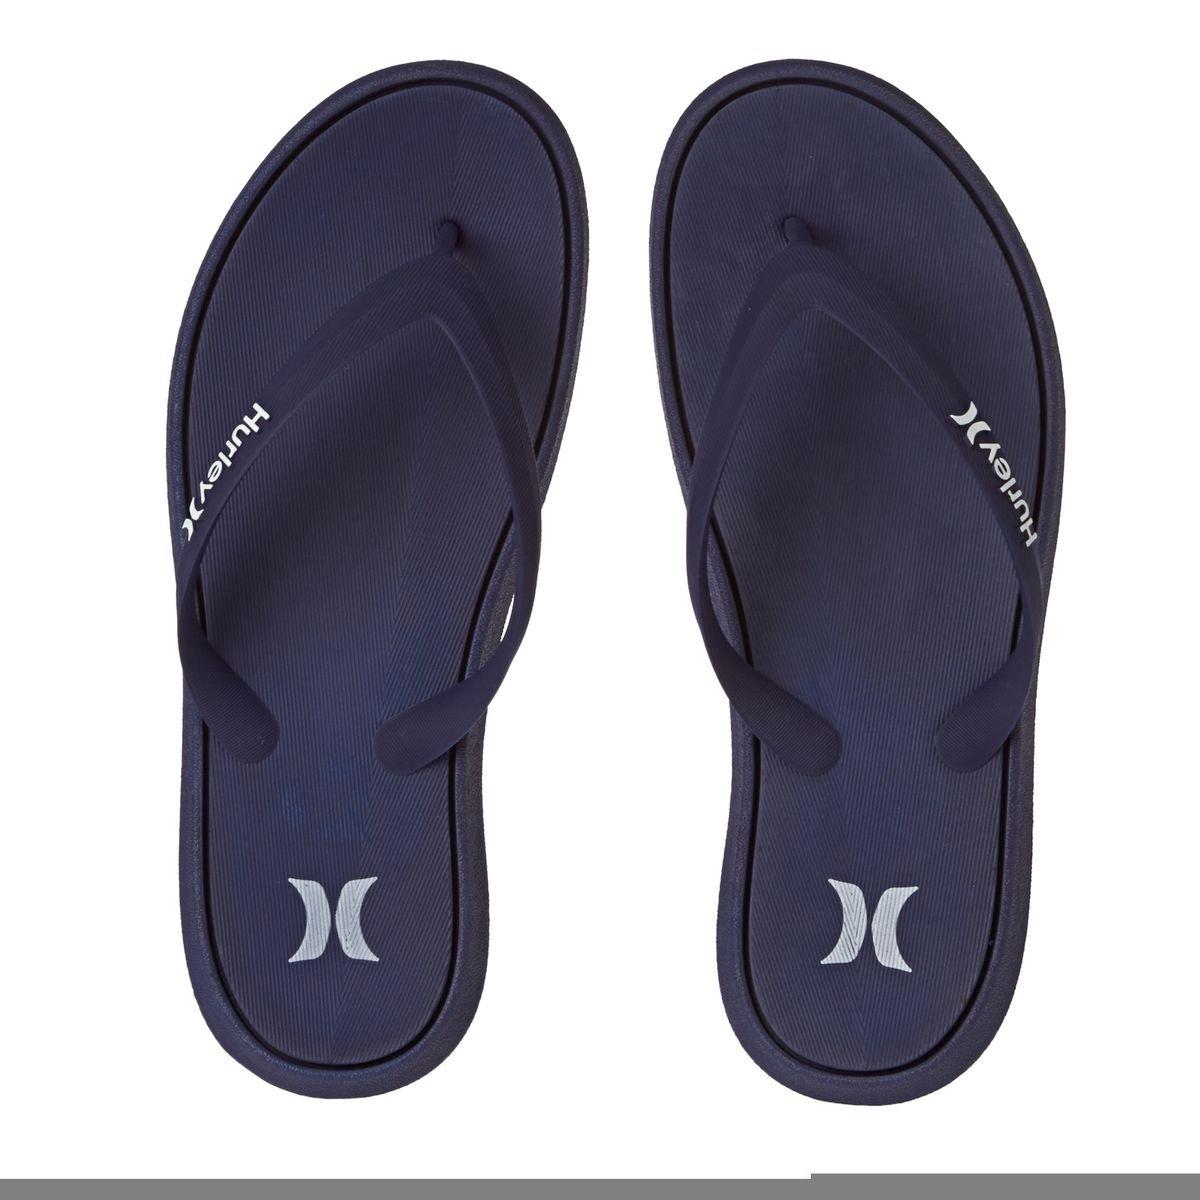 Hurley Infradito One /& Only Sandal RD//BK